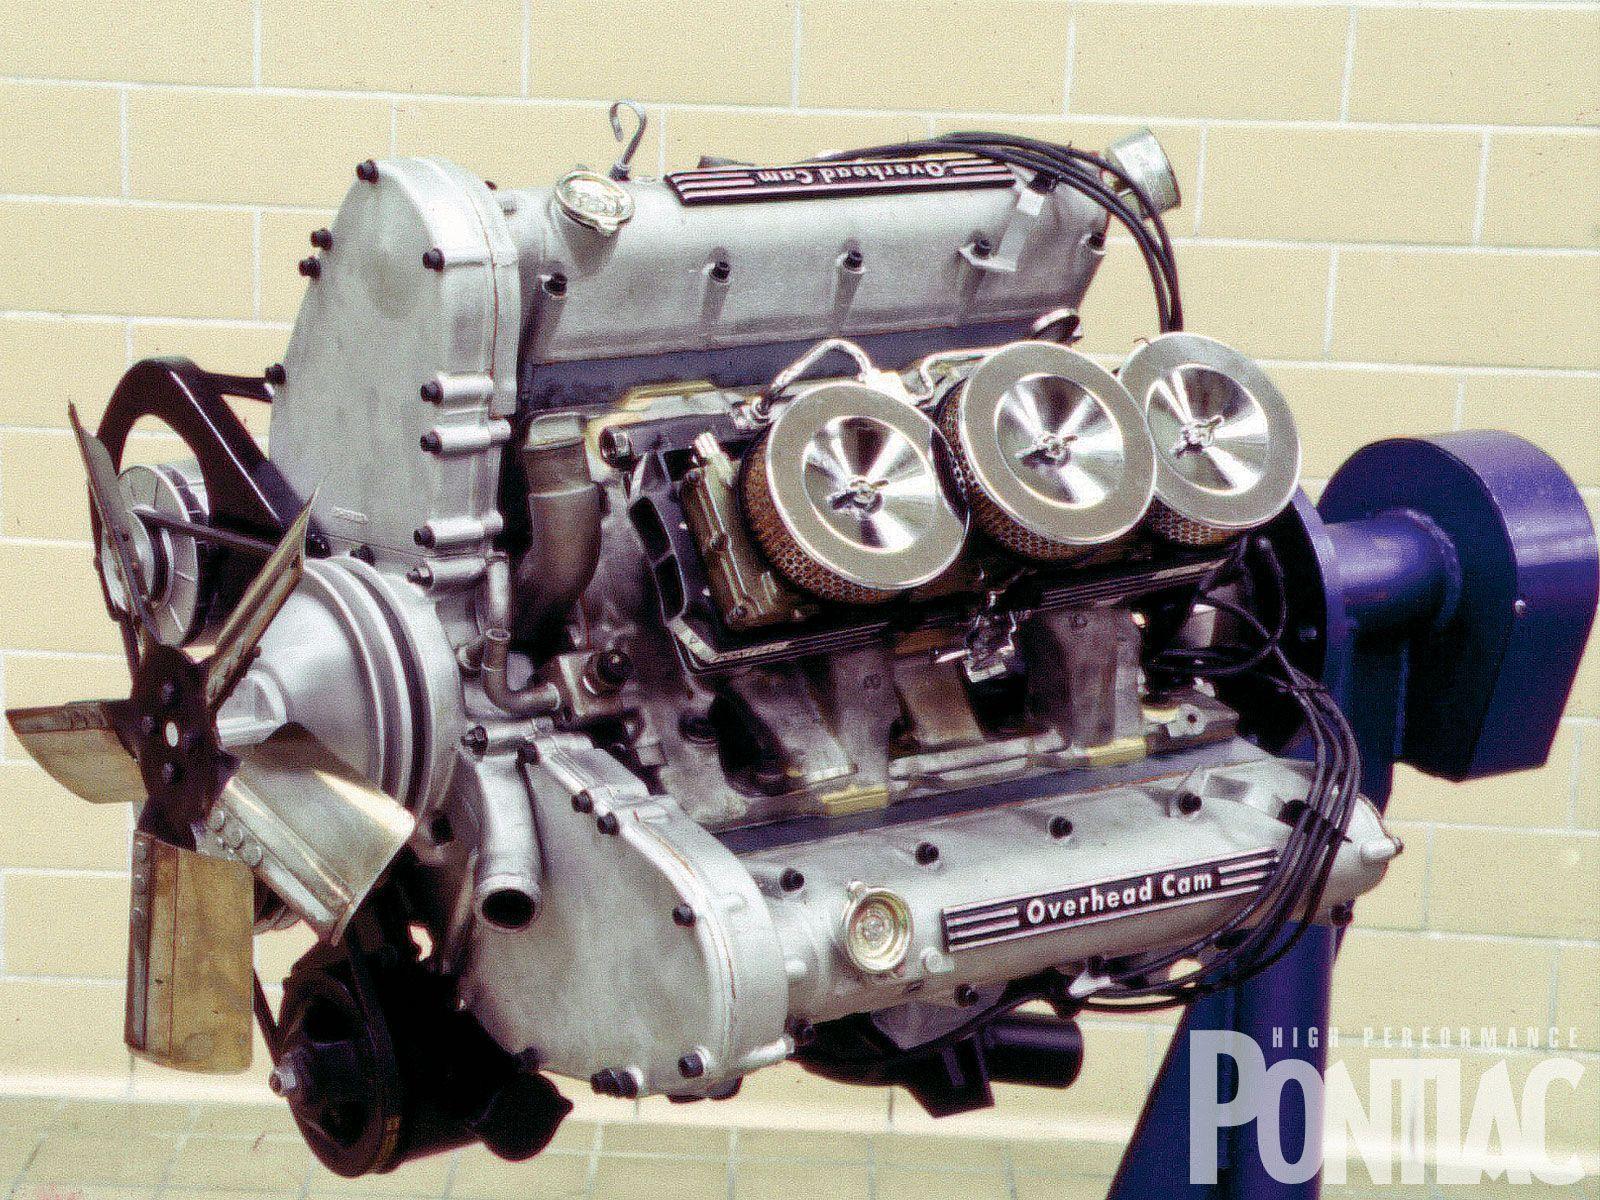 Race Engine Magazine Twin P Pump Cummins Diesel Power Pontiac Technology V8 Engines High Performance Costom